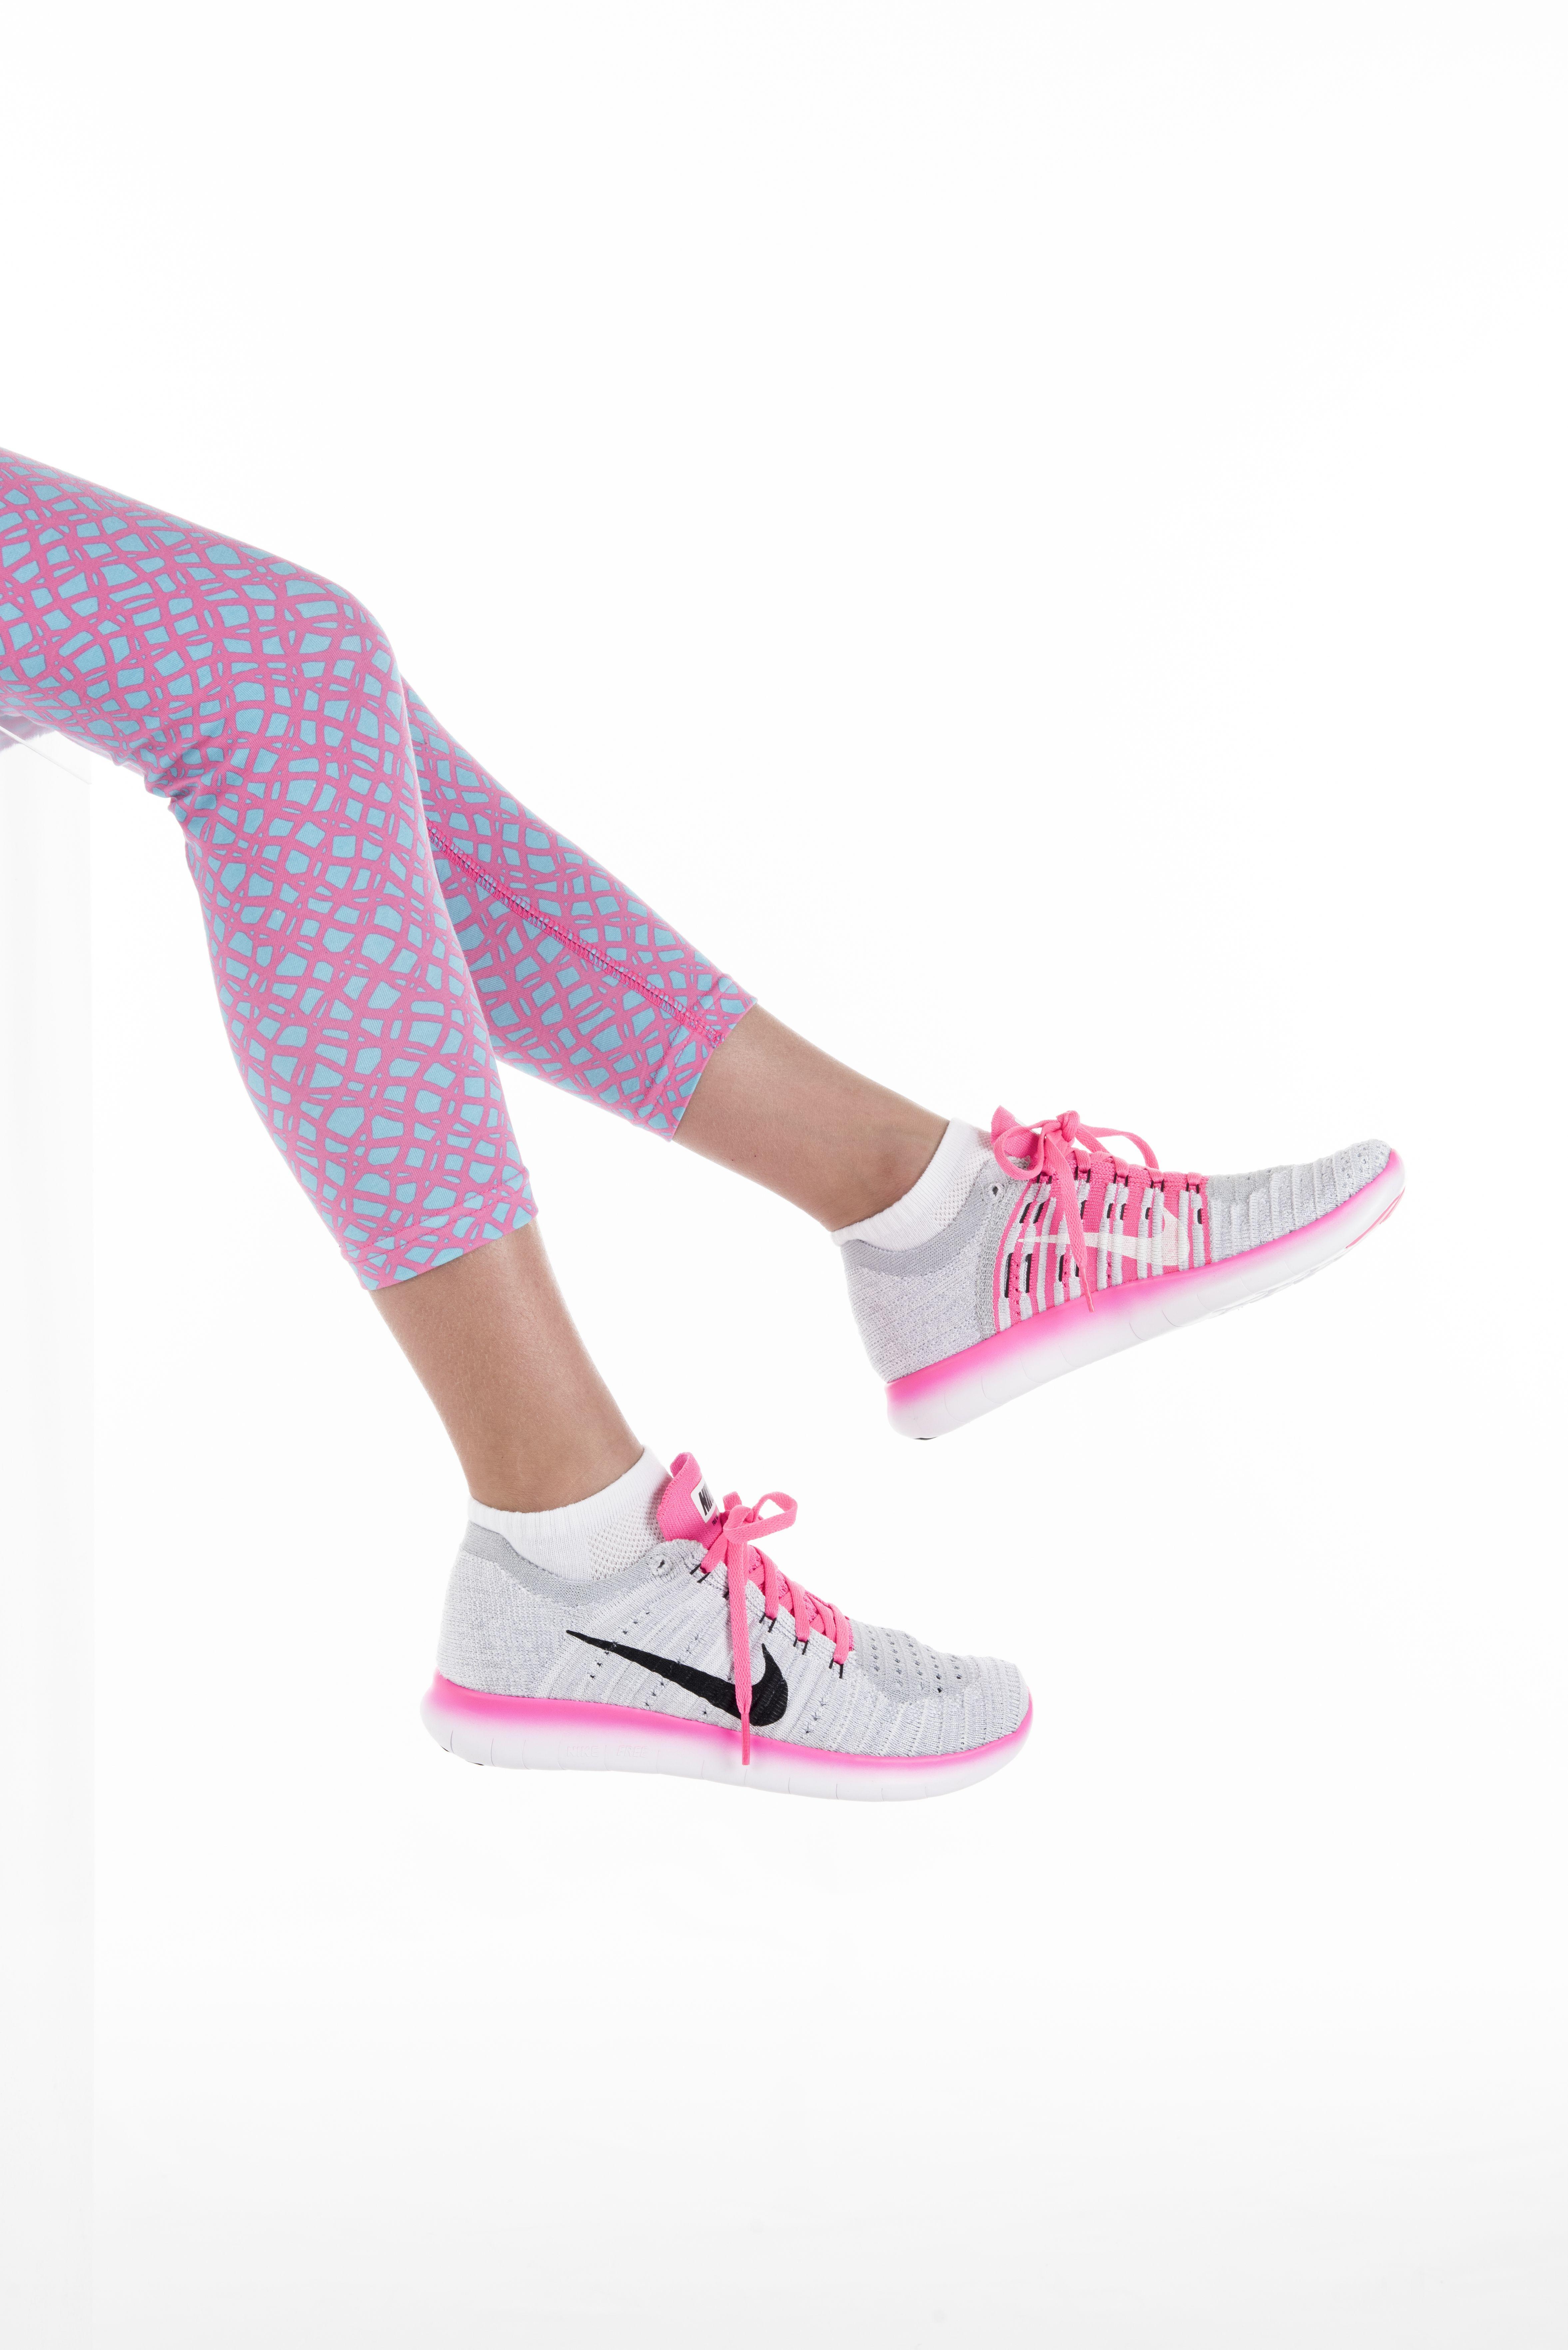 Girls Nike Free RN Flyknit   Finish Line Kids   Pinterest   Running shoes,  Running and Girls